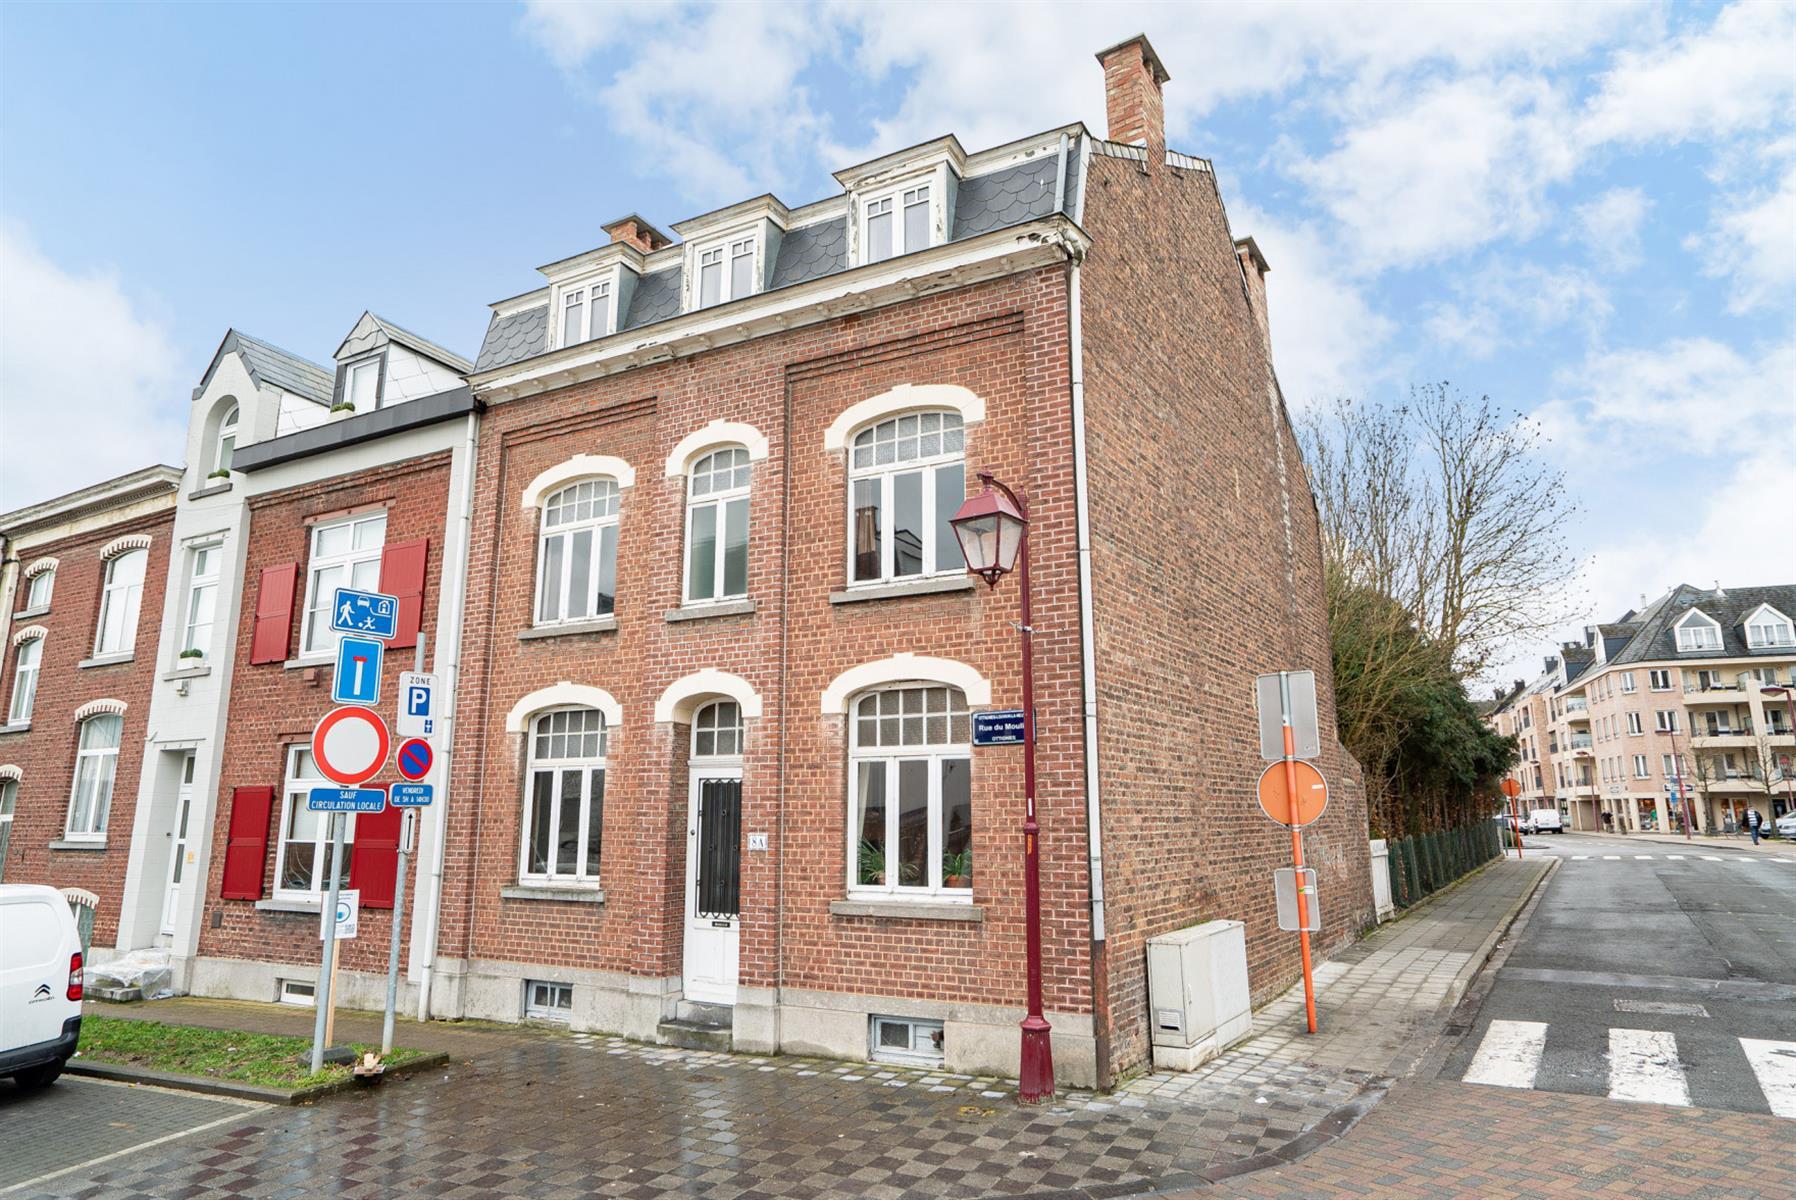 Maison - Ottignies-Louvain-la-Neuve - #4262981-1